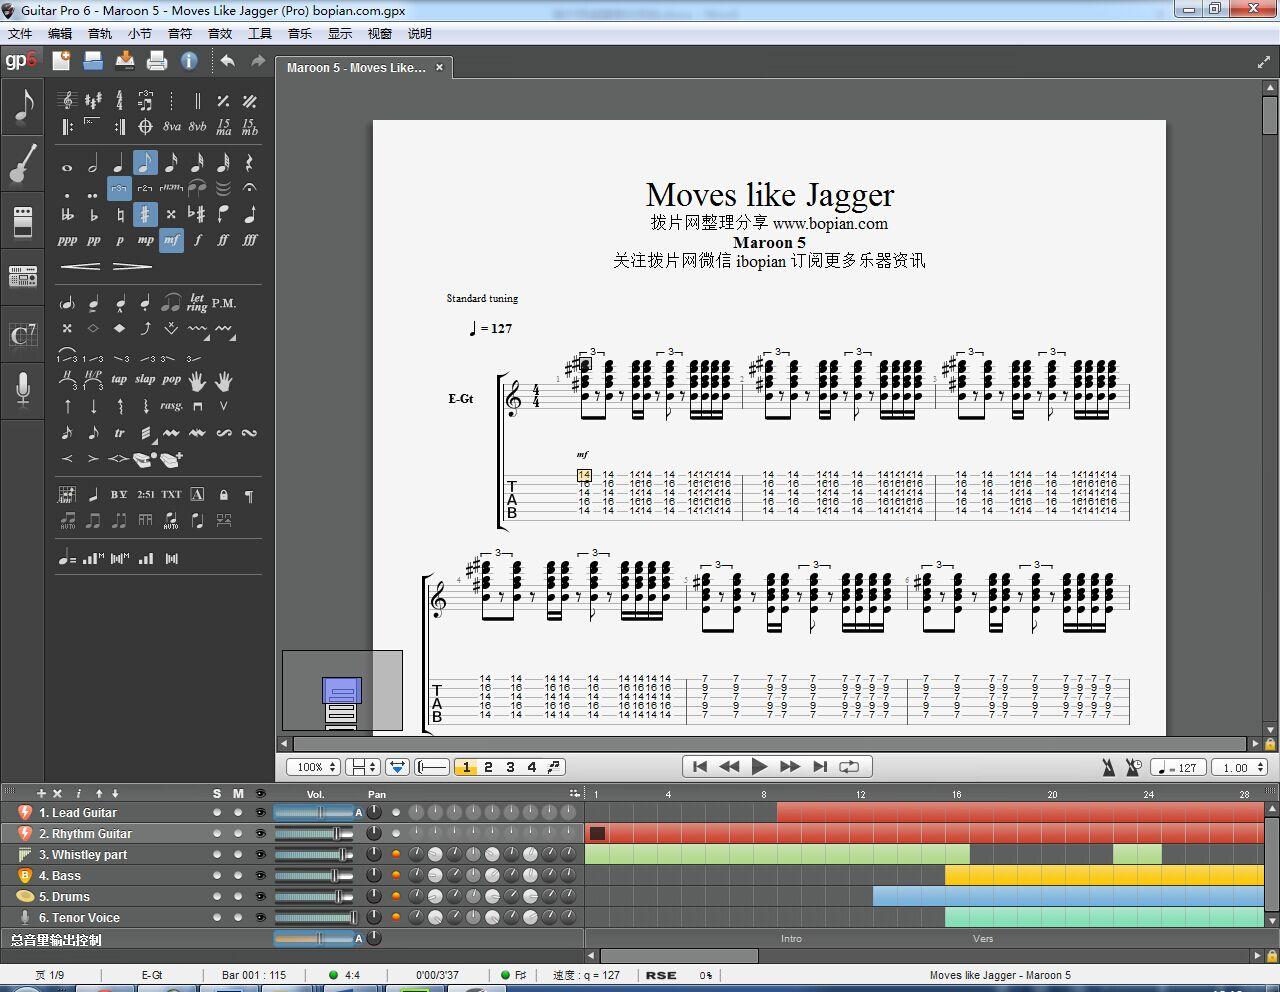 乐队谱 吉他谱 贝斯谱 口哨谱 鼓谱 人声谱 Maroon 5 Moves Like Jagger